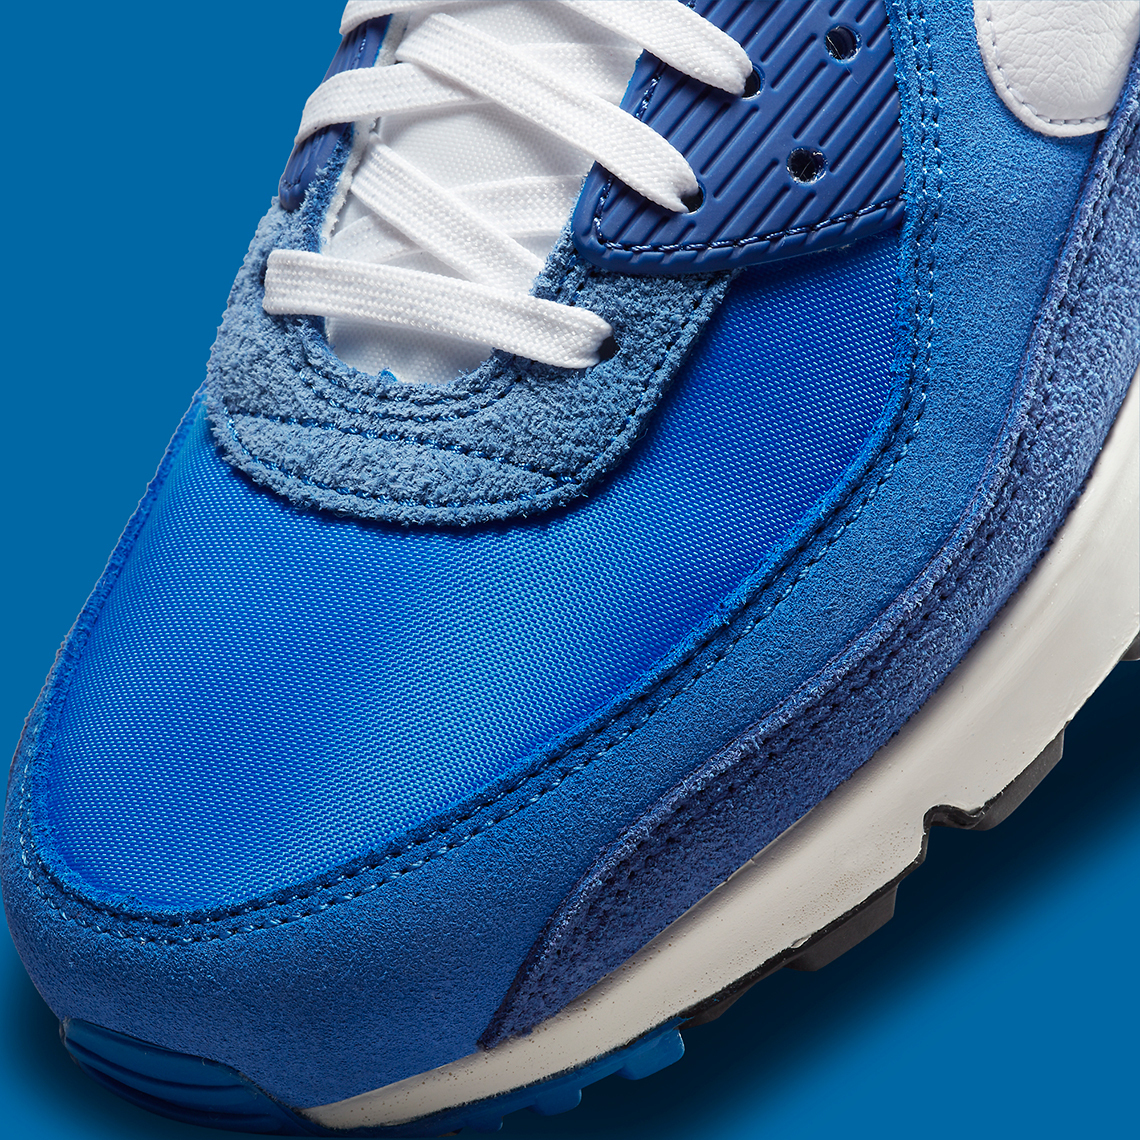 Nike Air Max 90 SE ''First Use'' - DB0636-400